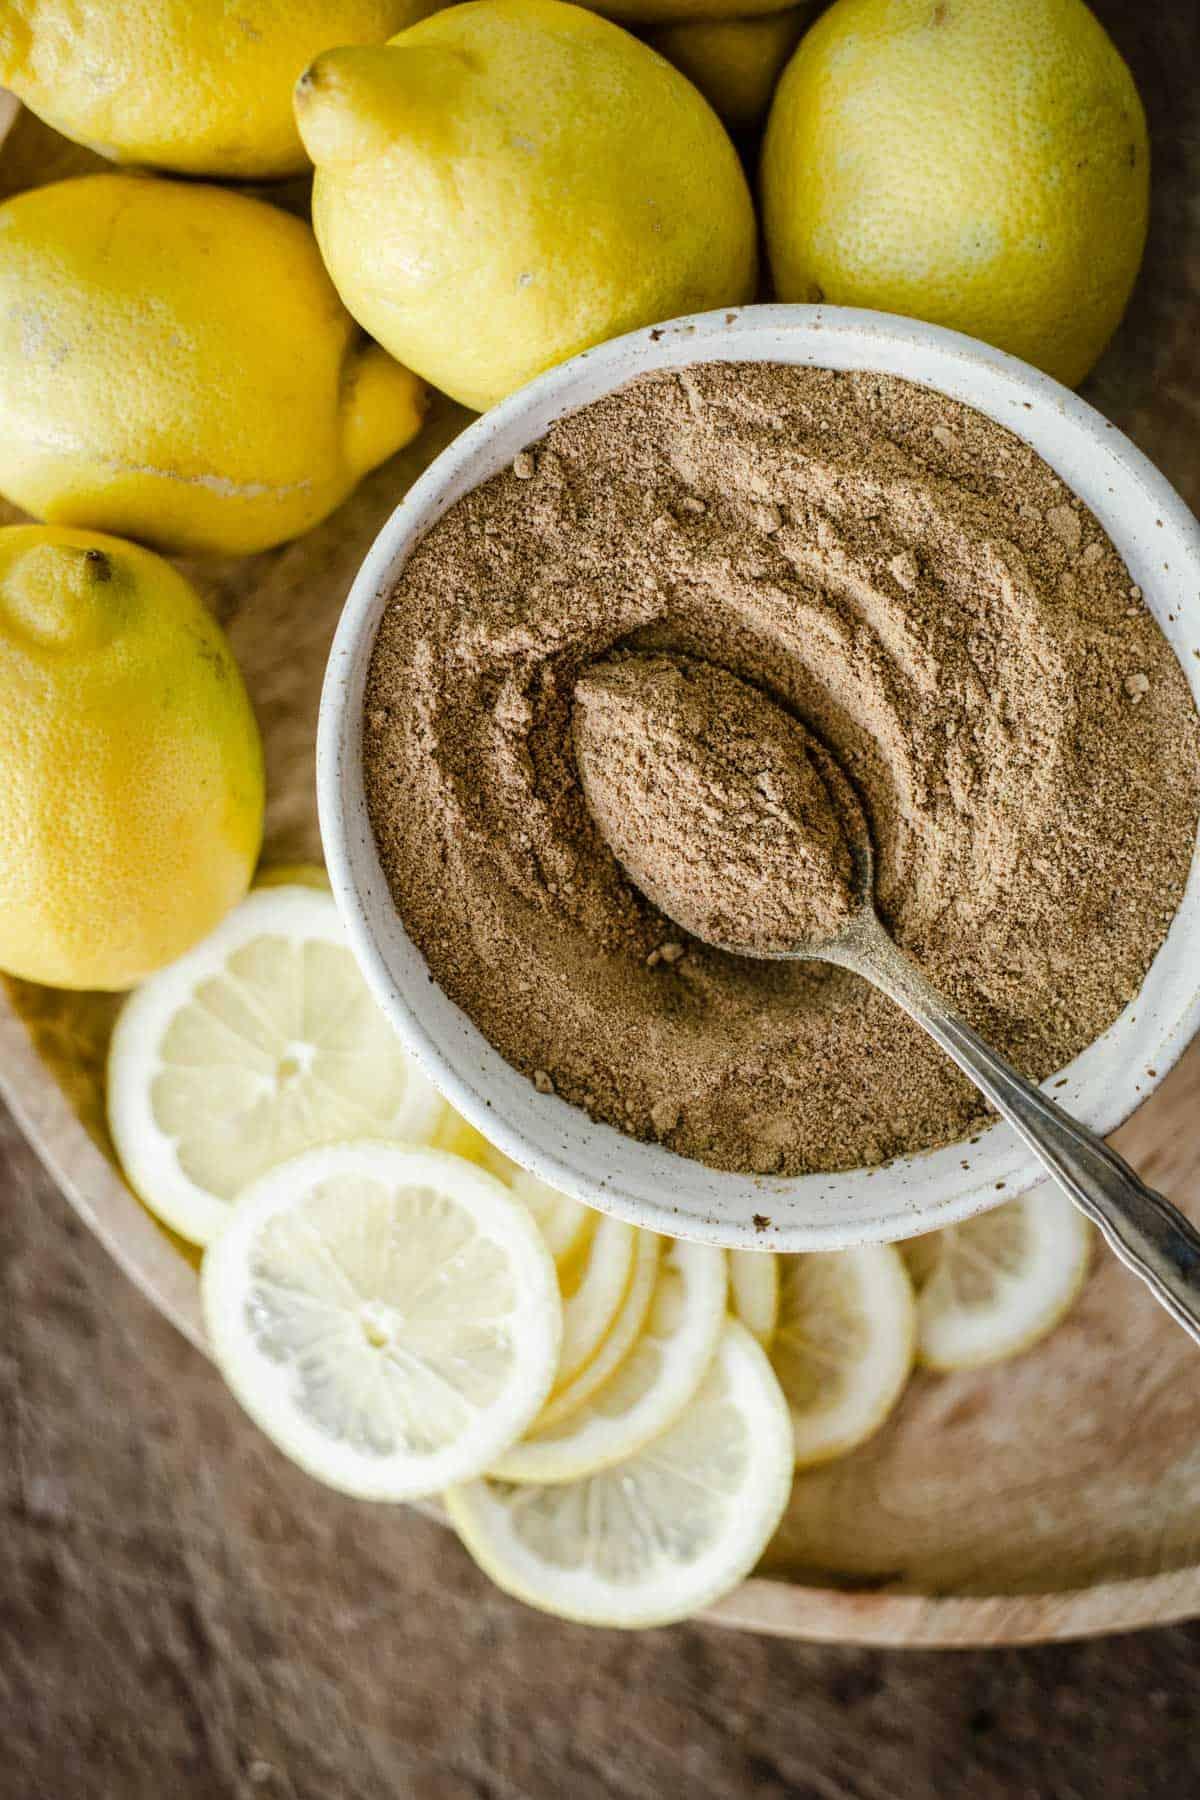 homemade lemon powder in a bowl surrounded by lemons